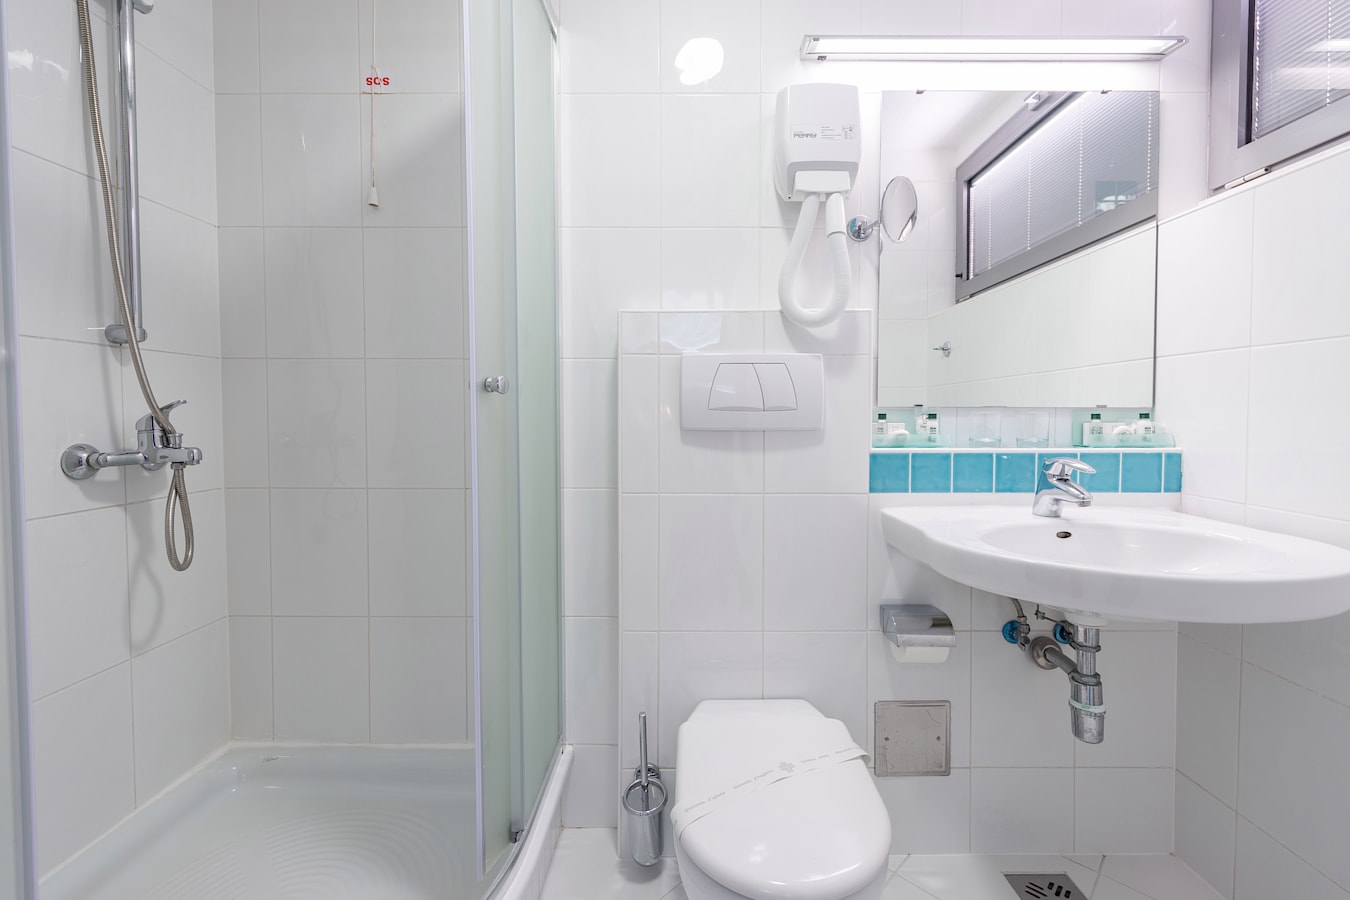 uvlala-hotel-room-bathroom-shower.jpg